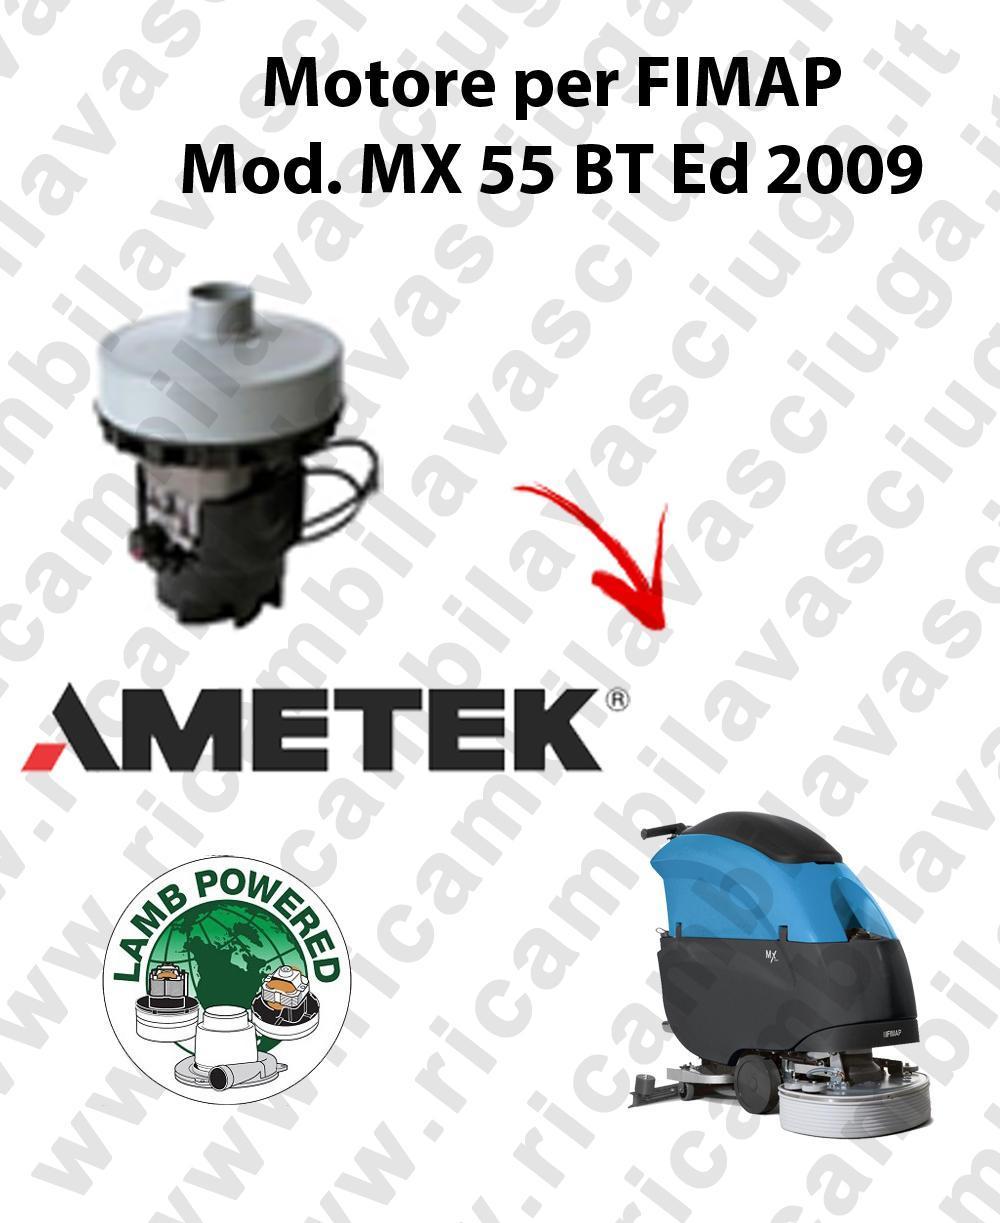 MX 55 BT Ed. 2009 Vacuum motor LAMB AMETEK scrubber dryer FIMAP